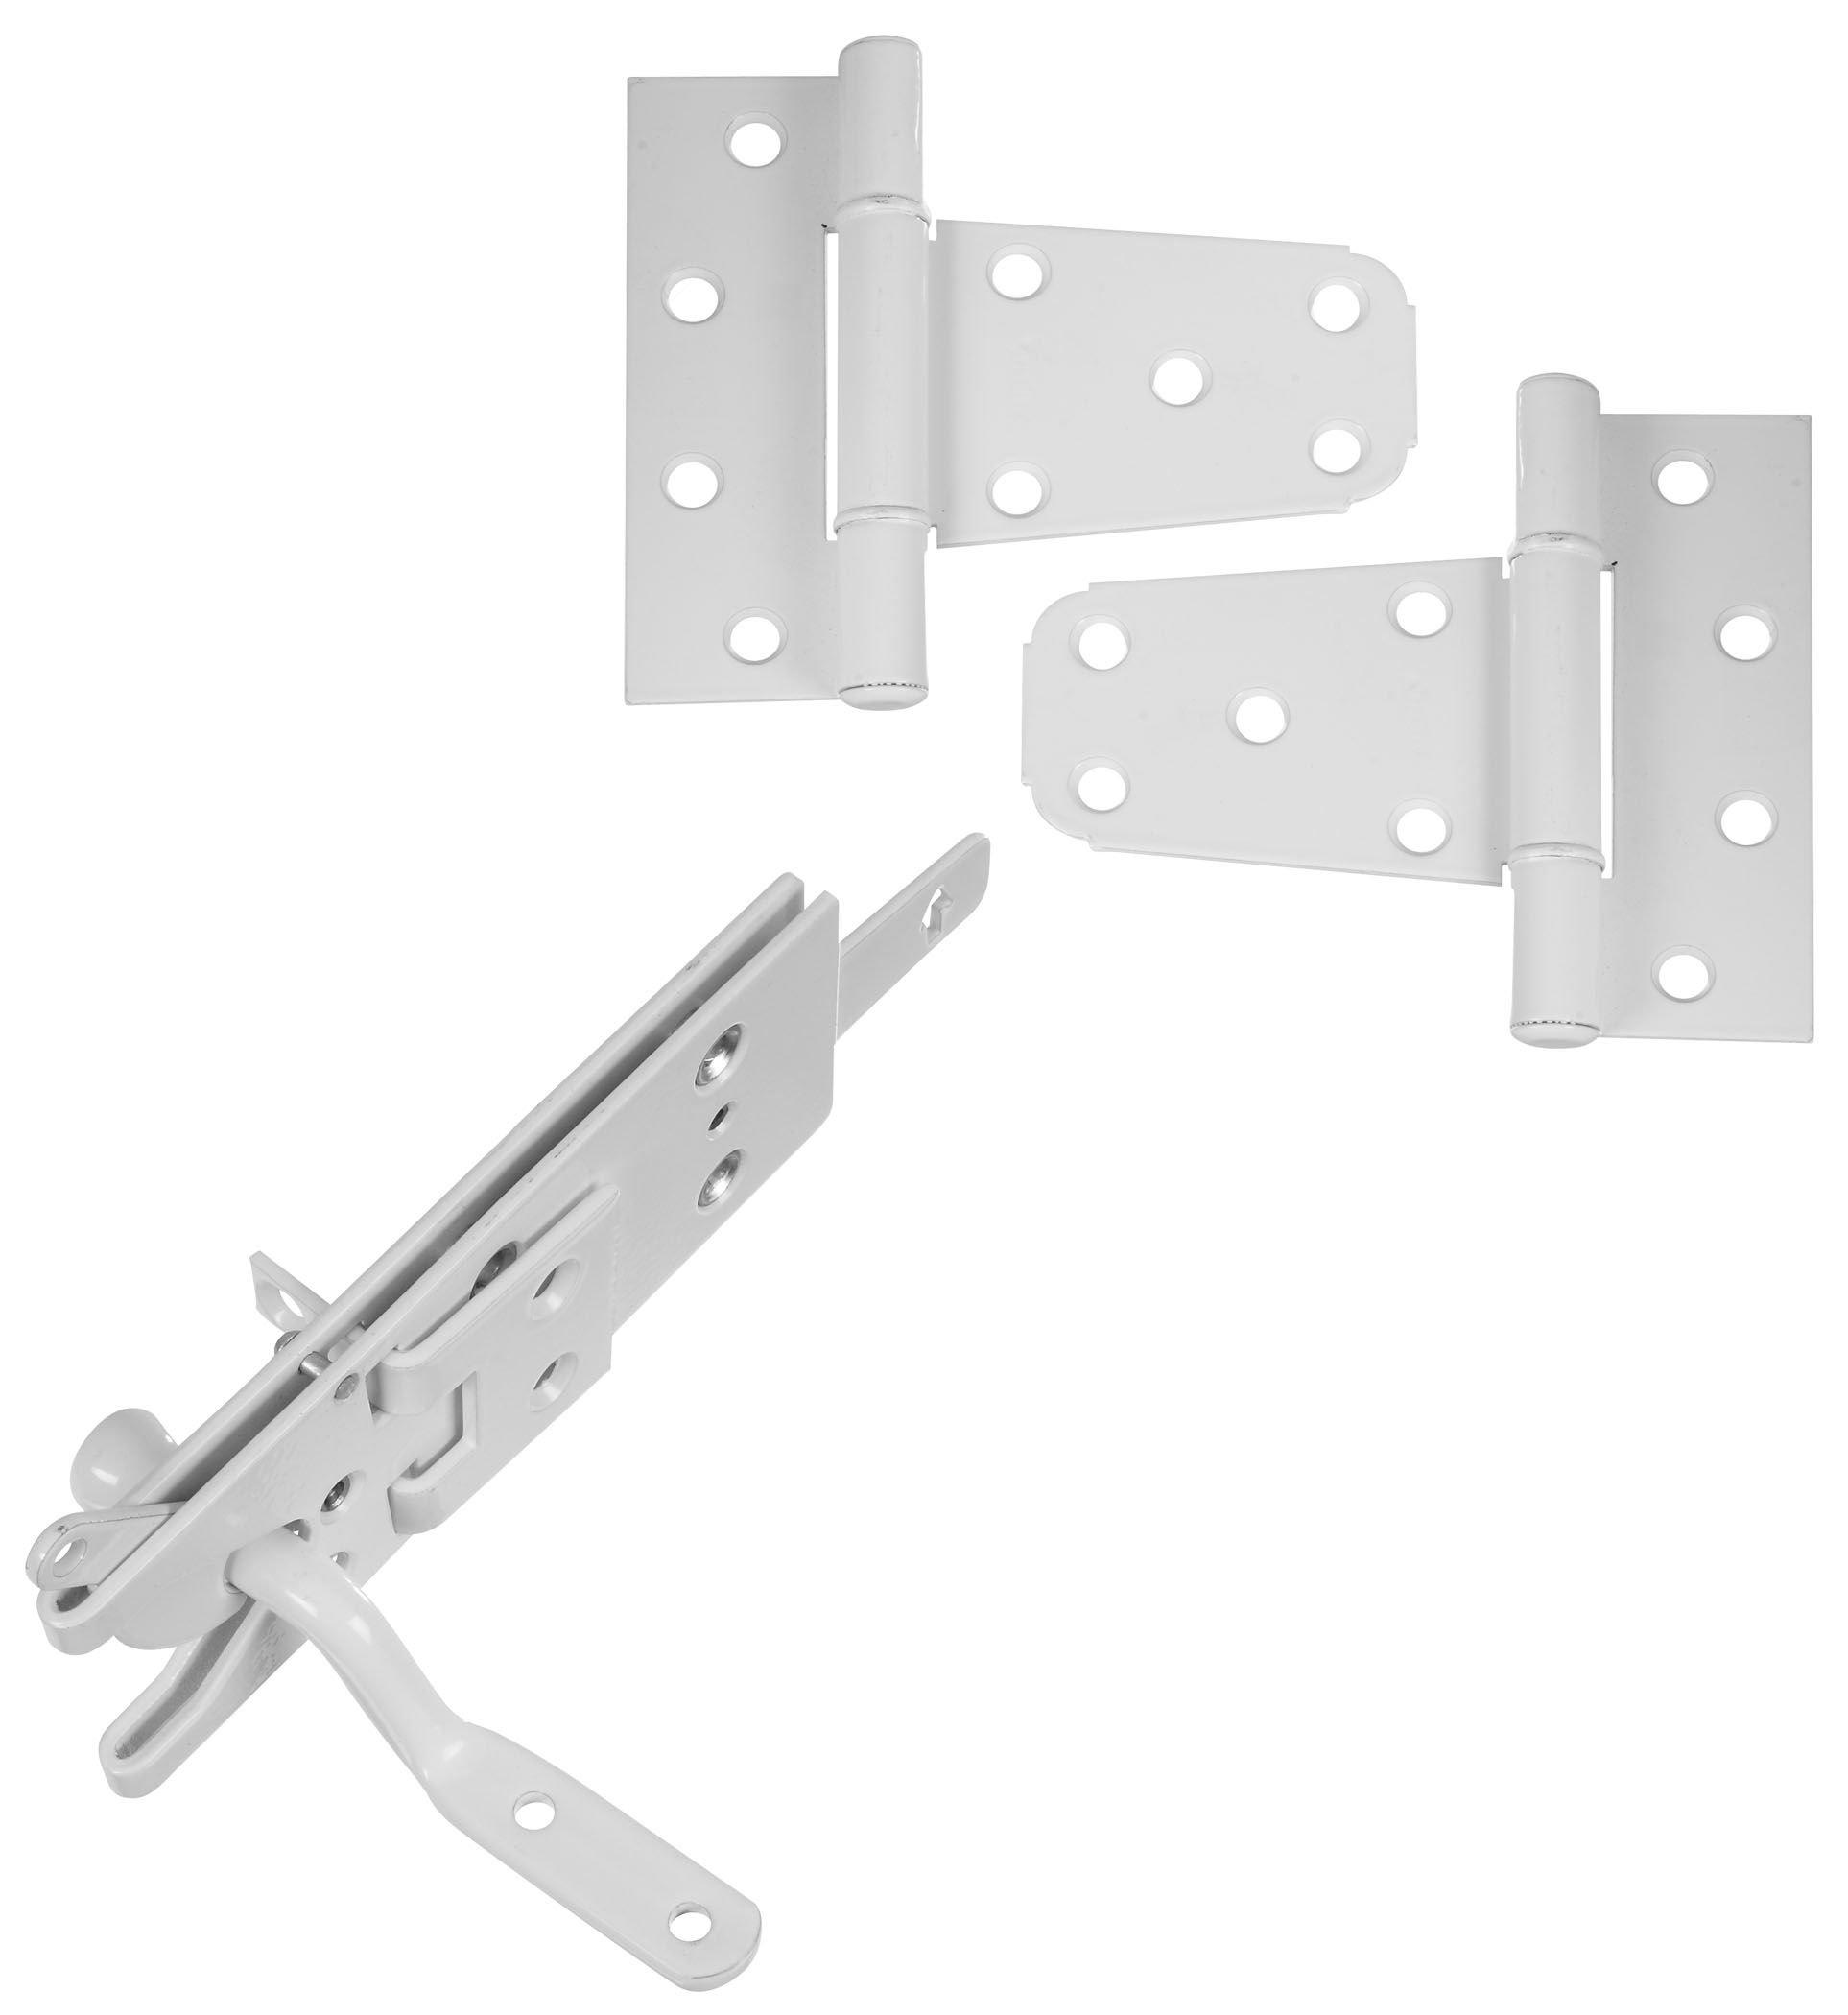 National Hardware N343-442 DPV876 Vinyl Fence Gate Kit in White powder coat